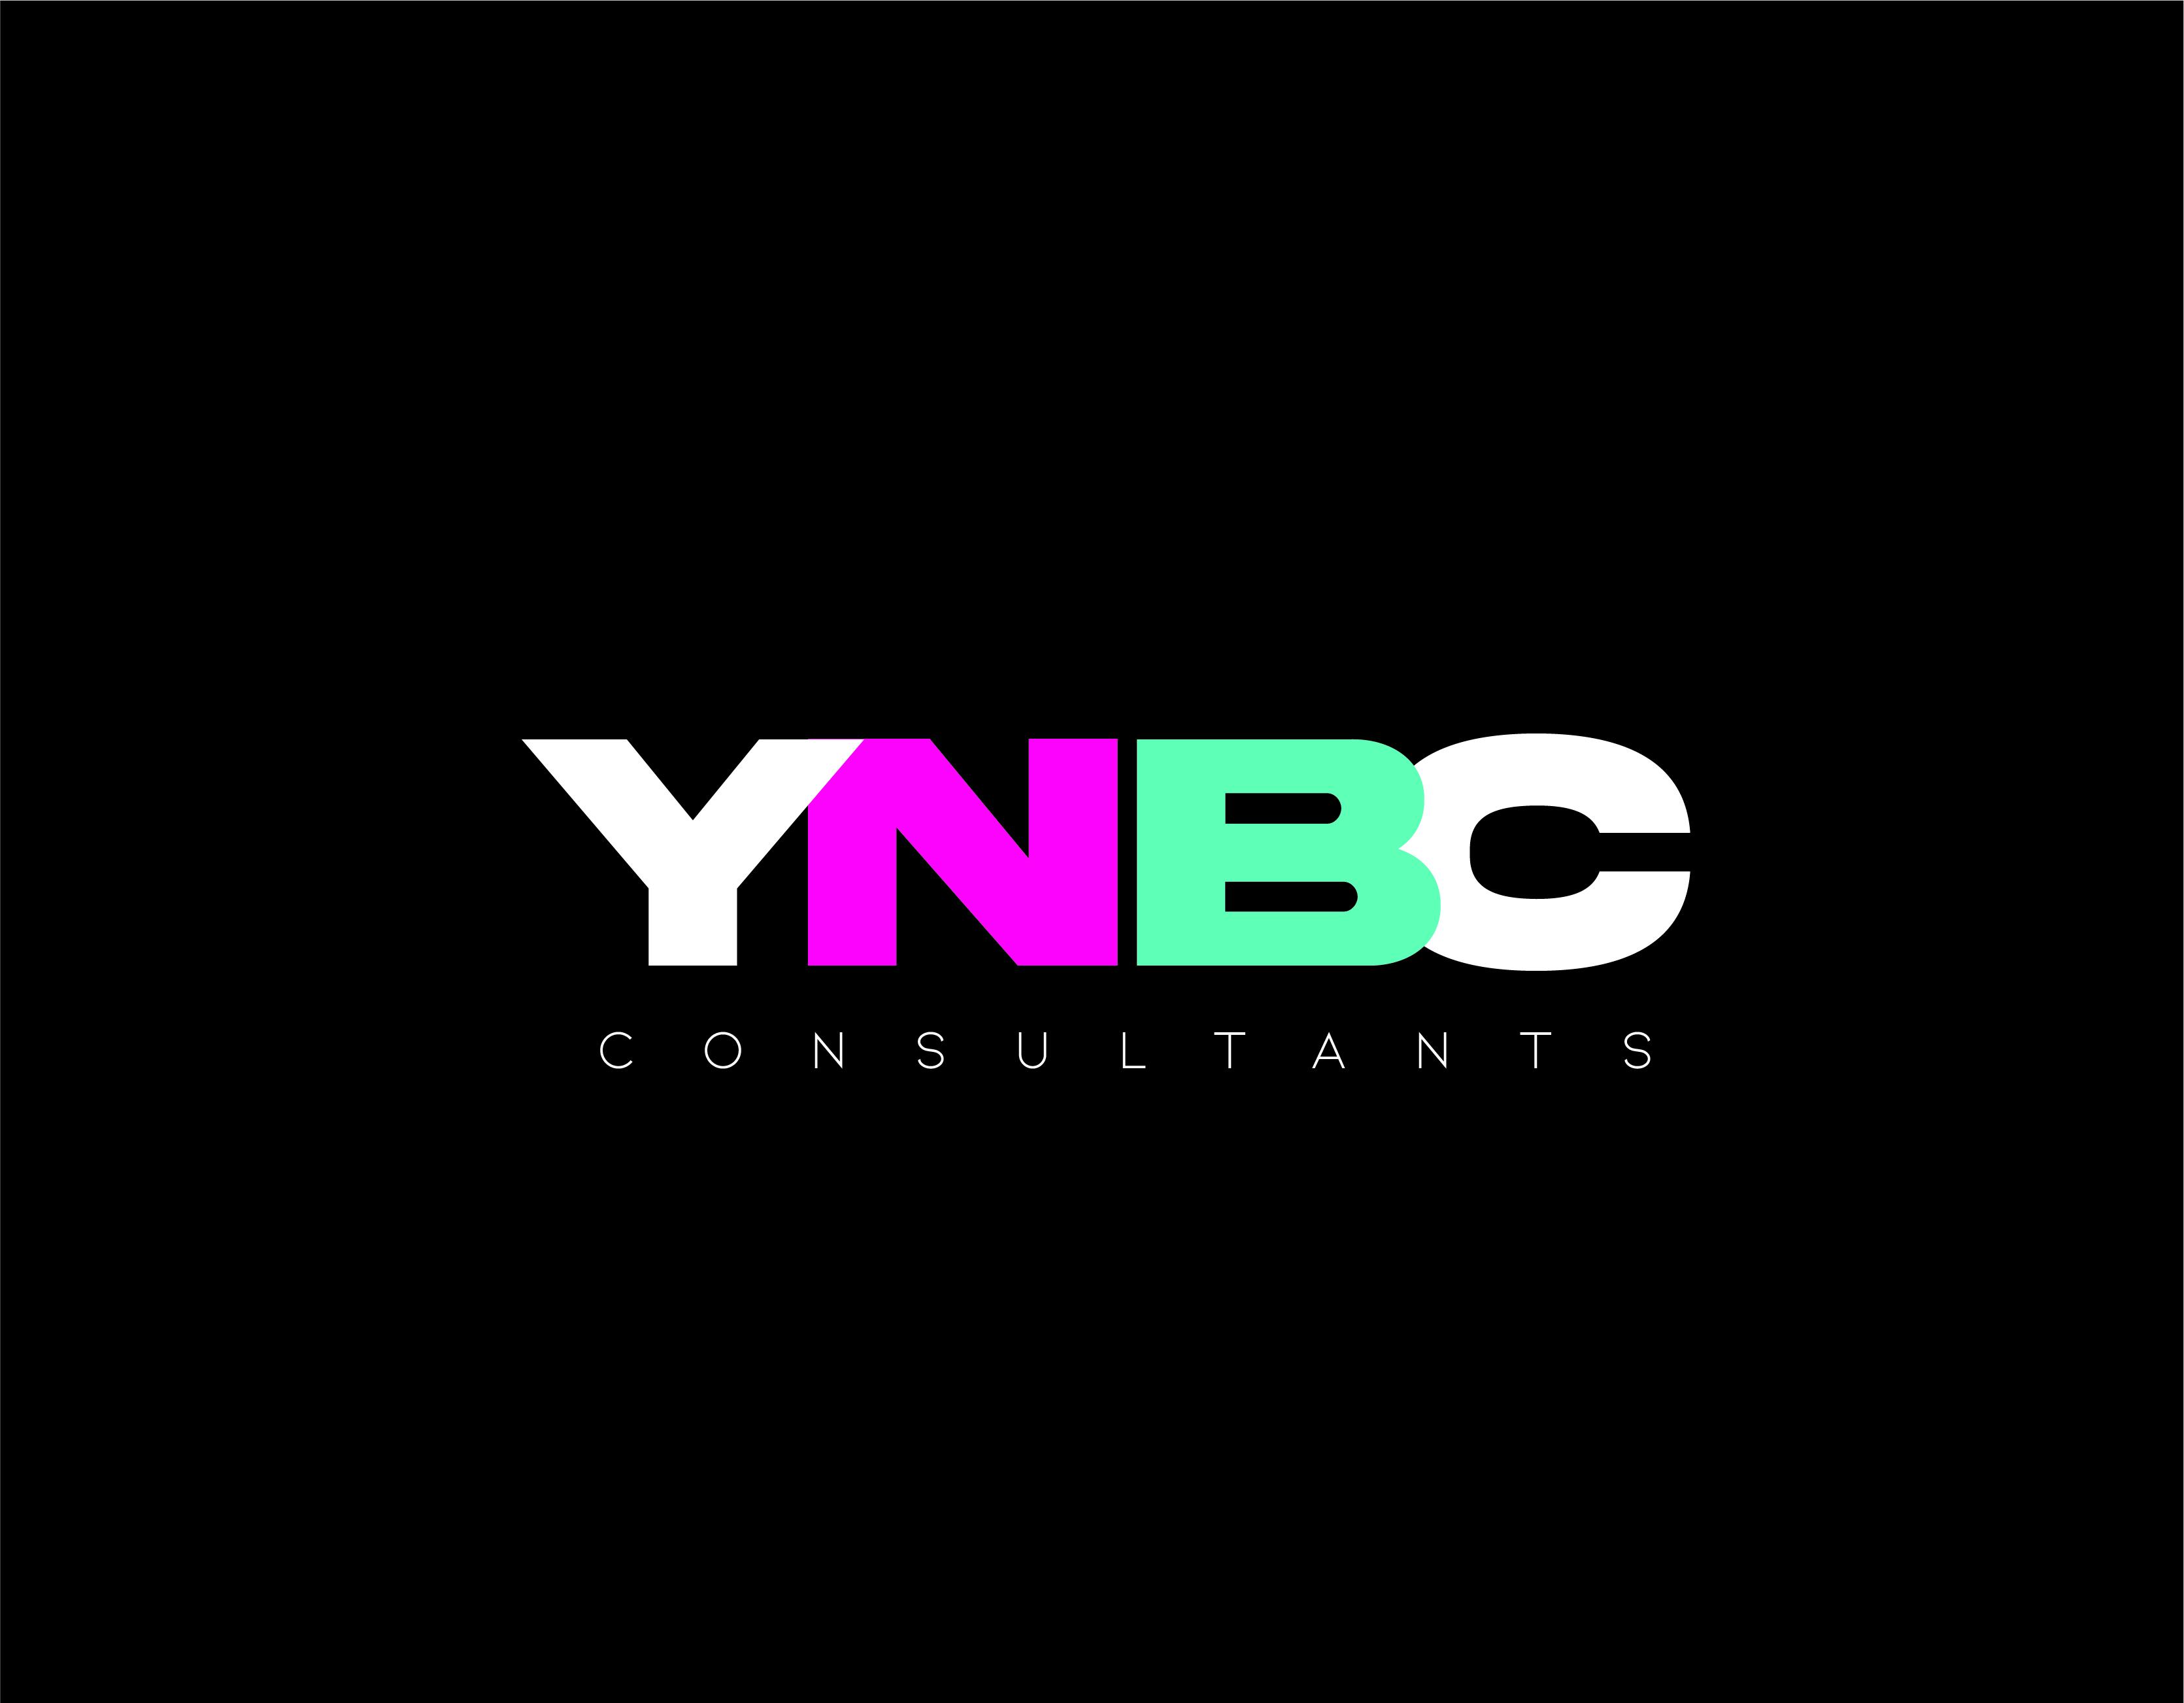 YNBCBLACK